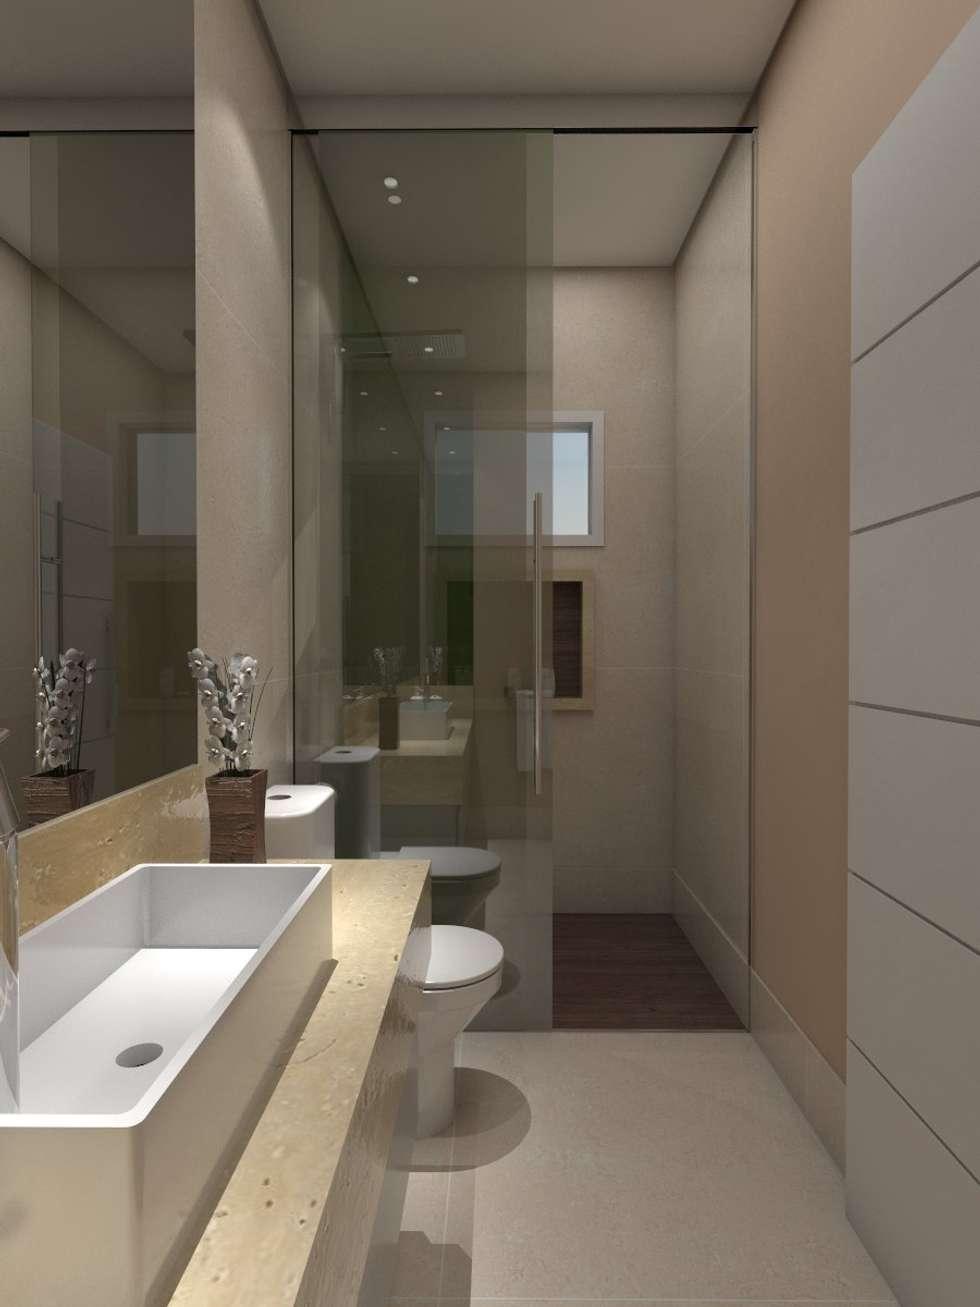 Fotos de decora o design de interiores e remodela es for Casas estilo moderno interiores